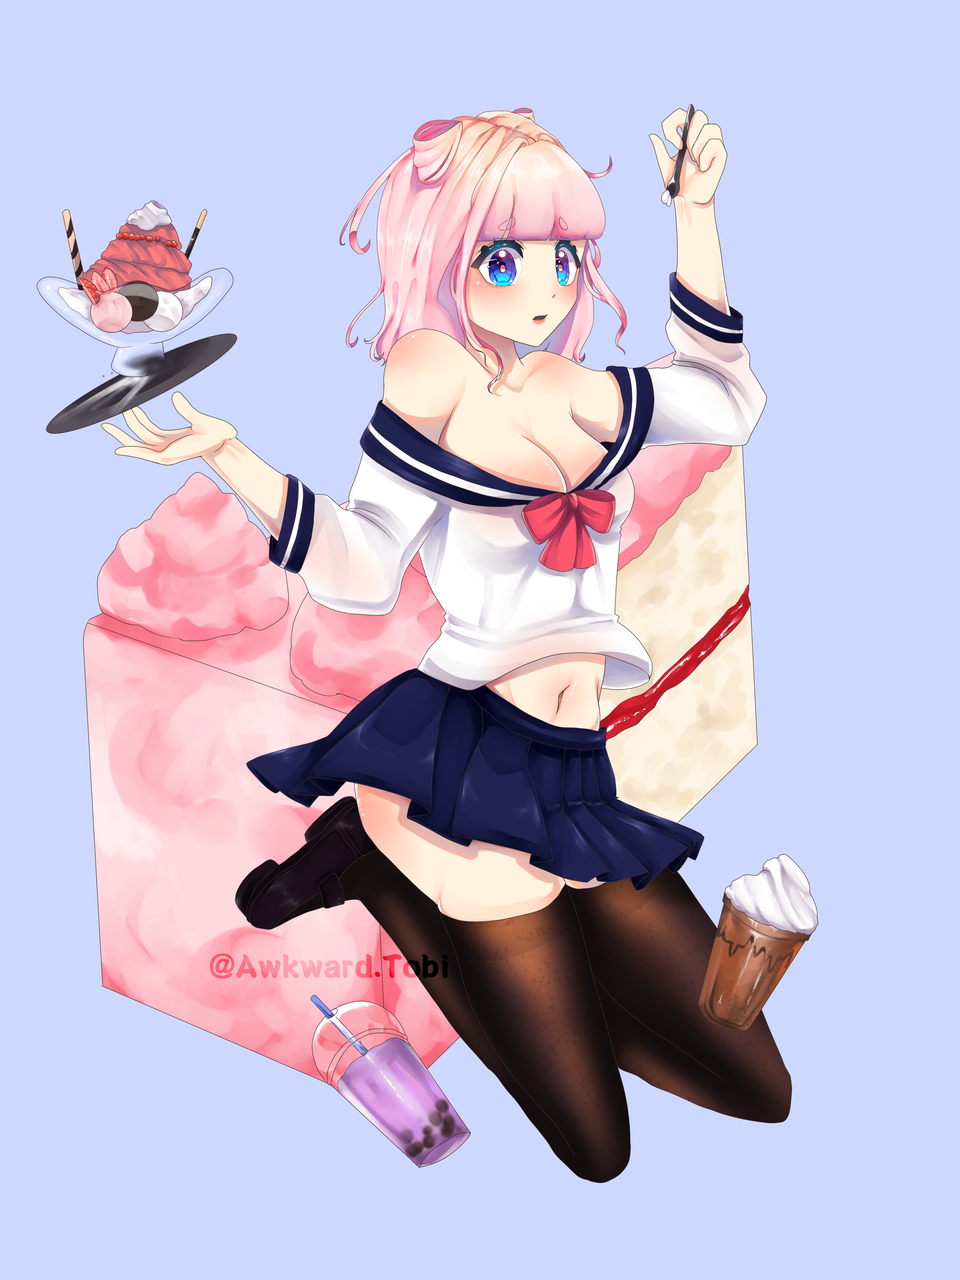 cafe addict Himari Illust of AwkwardTobi anime girl pastel illustration pastries